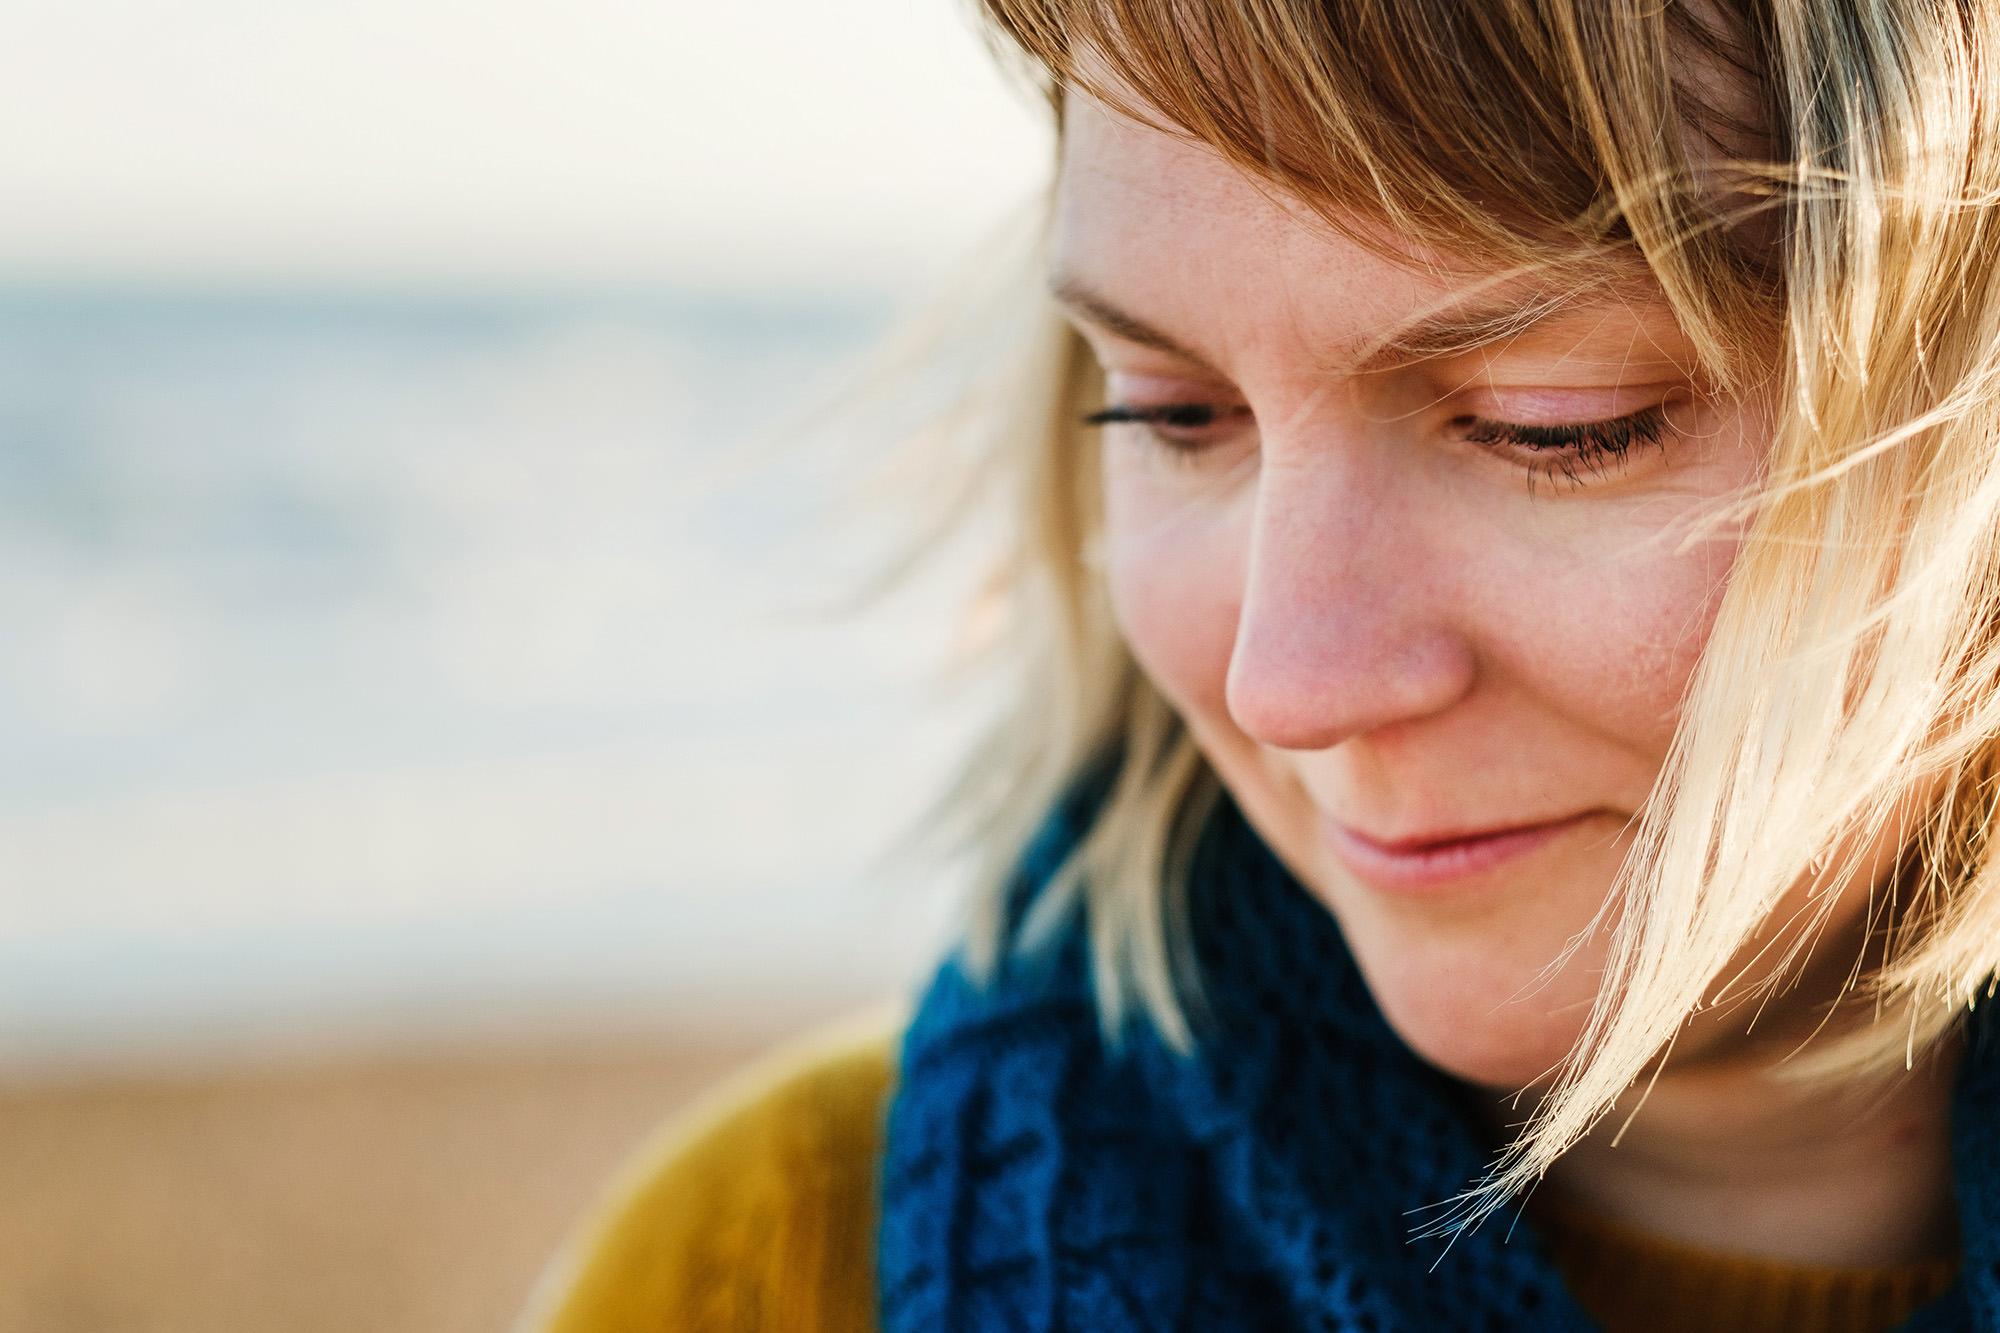 sunset beach portrait closeup